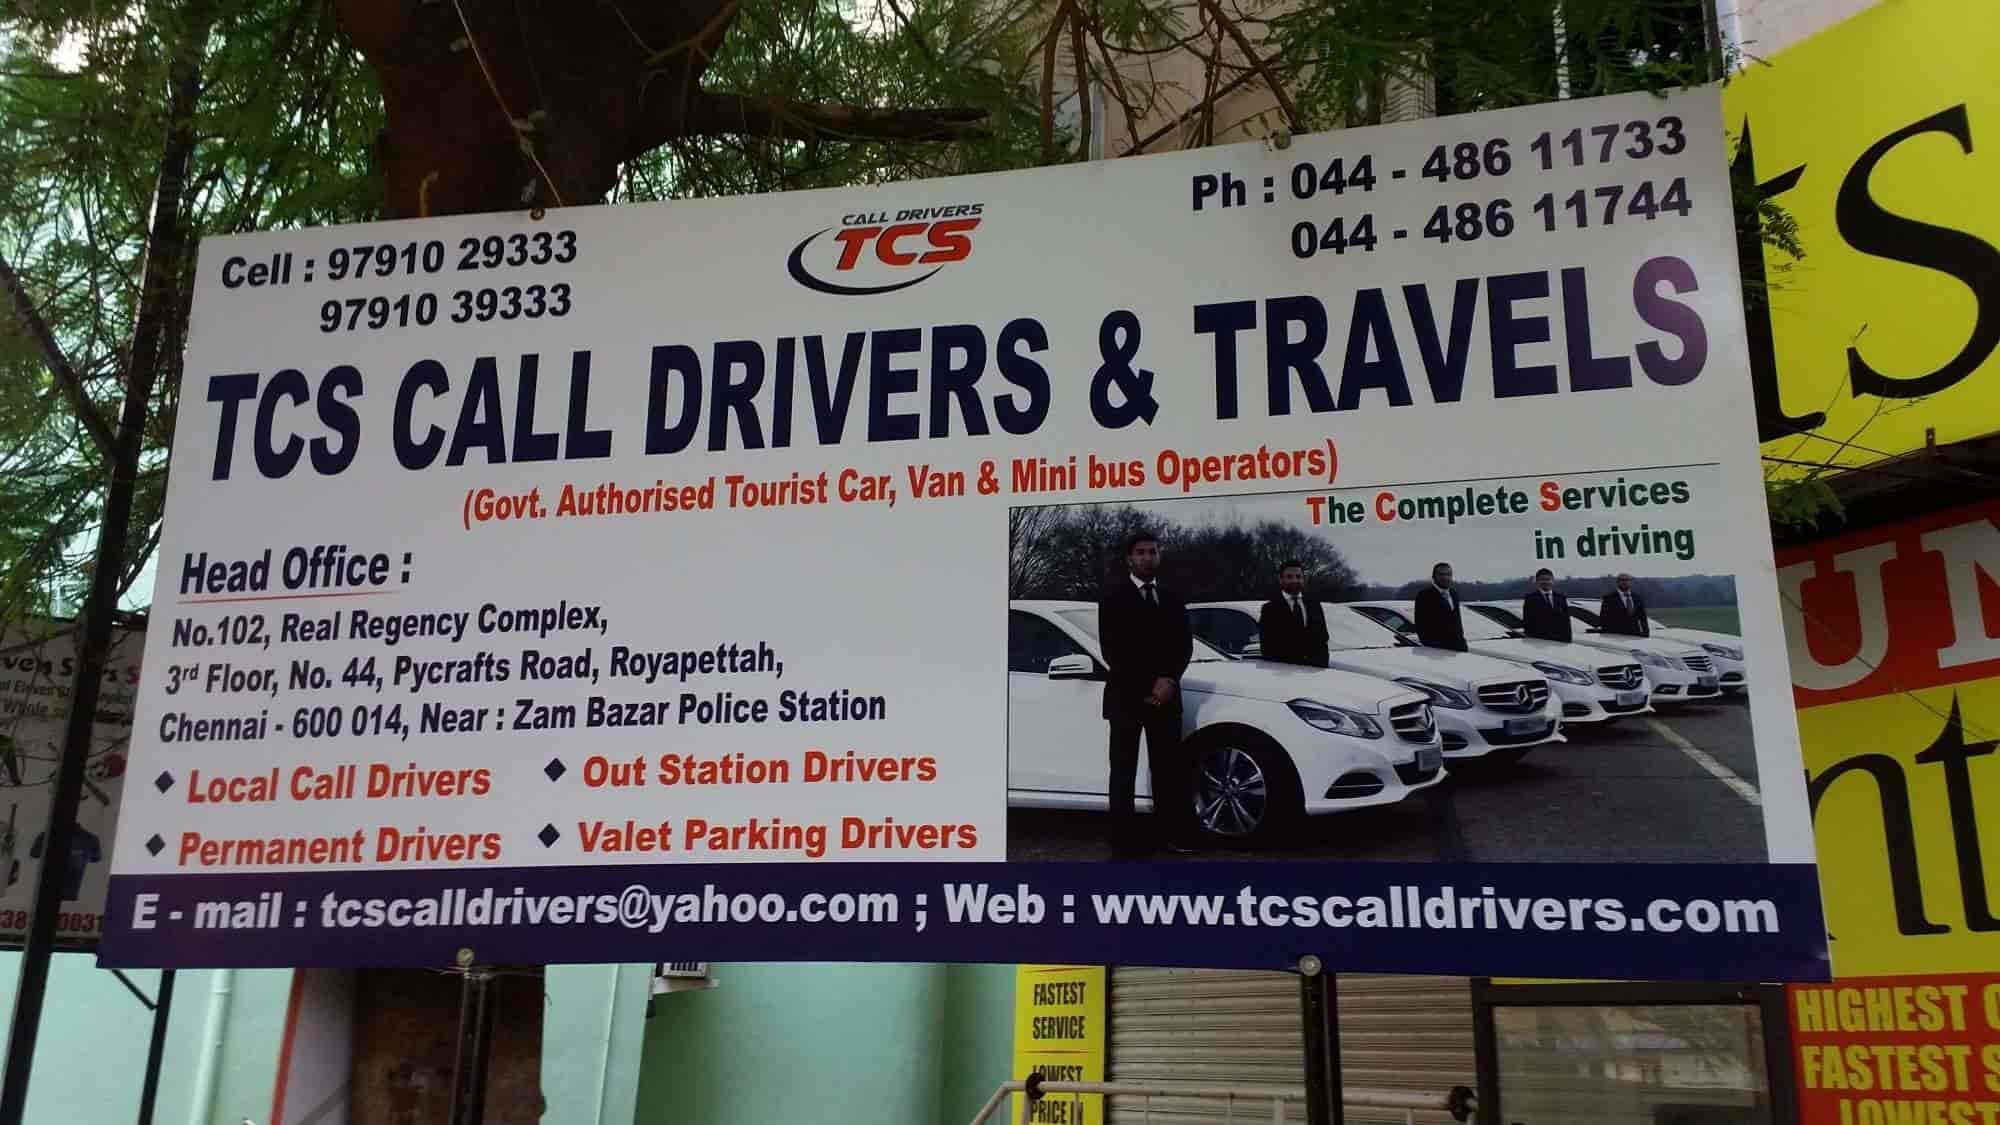 TCS Call Drivers & Travels, Royapettah - Driver Service